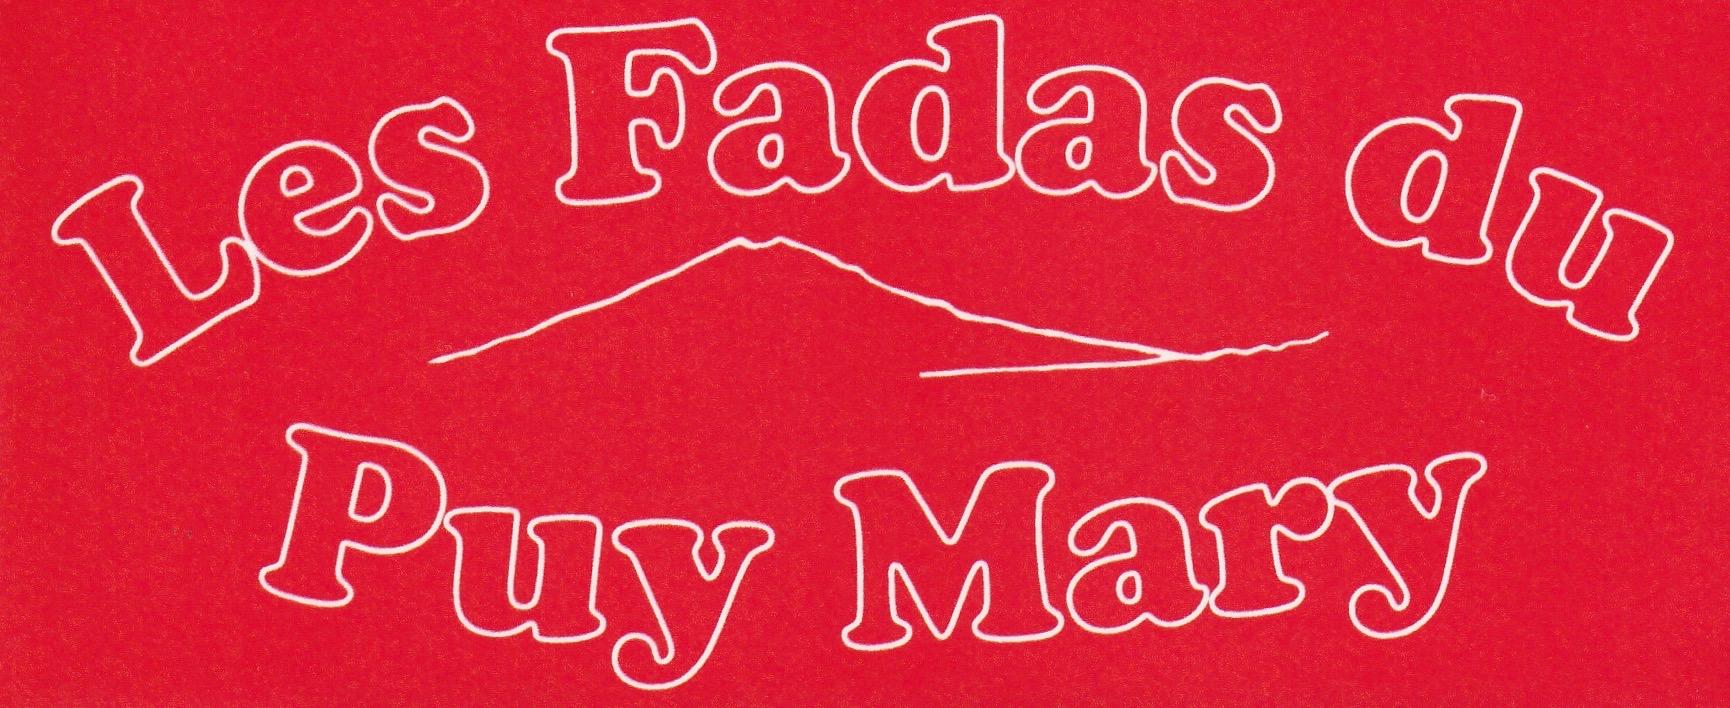 Logo Les Fadas du Puy Mary.jpg